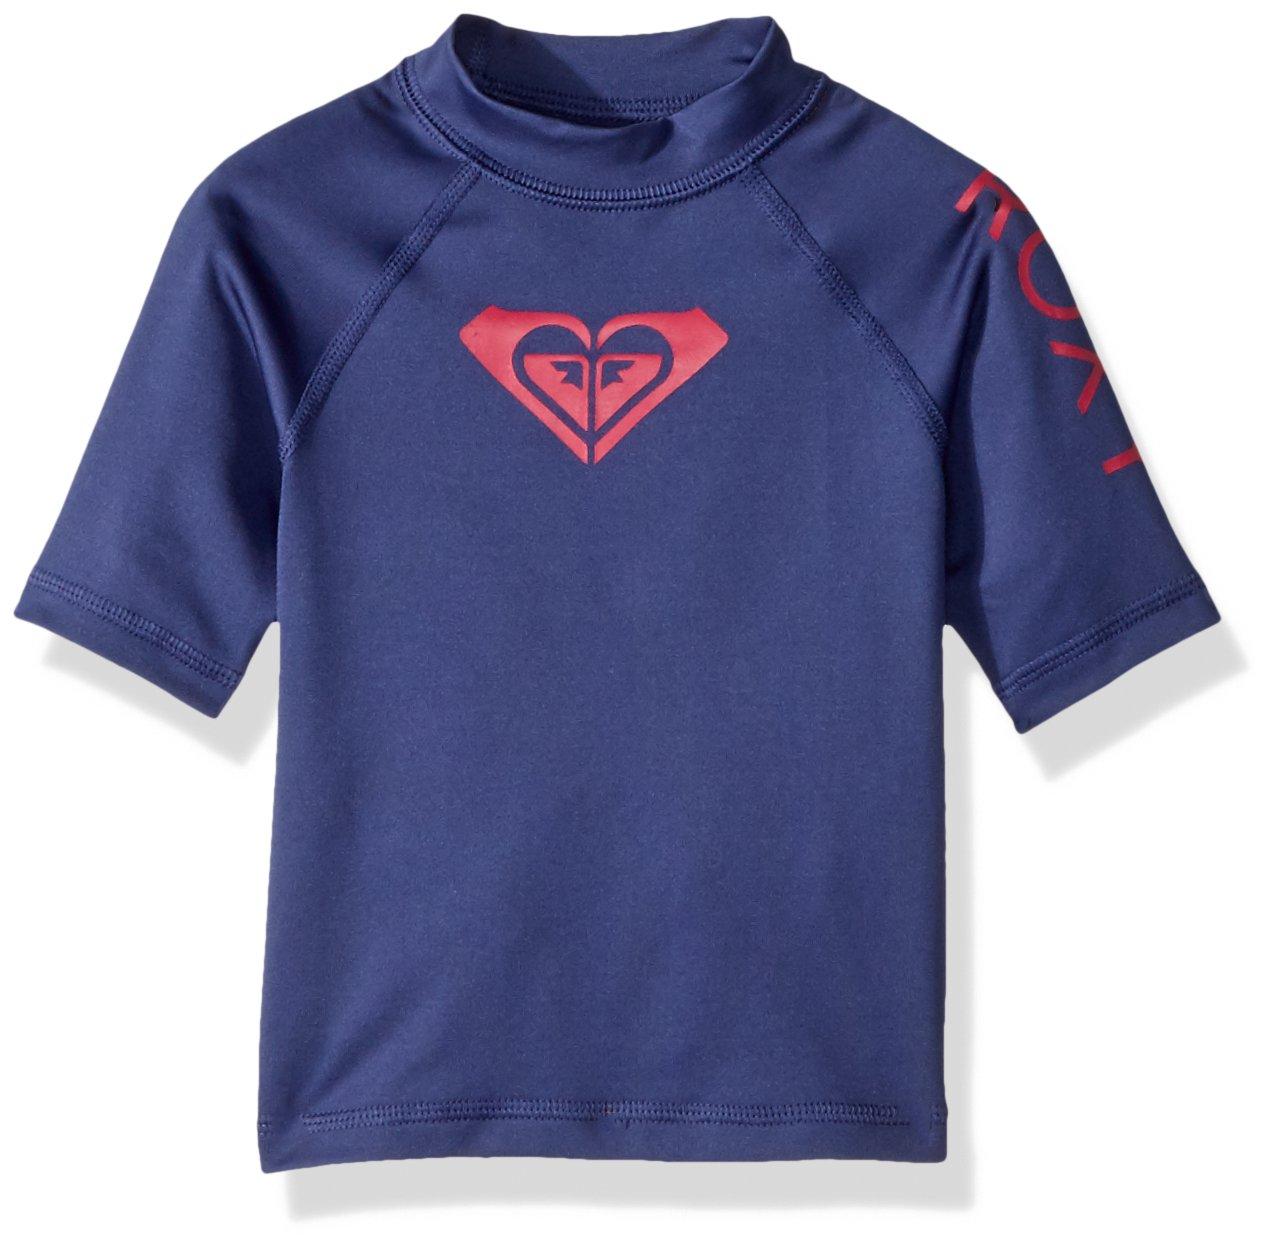 Roxy Toddler Girls' Whole Hearted Short Sleeve Rashguard, deep Cobalt, 2